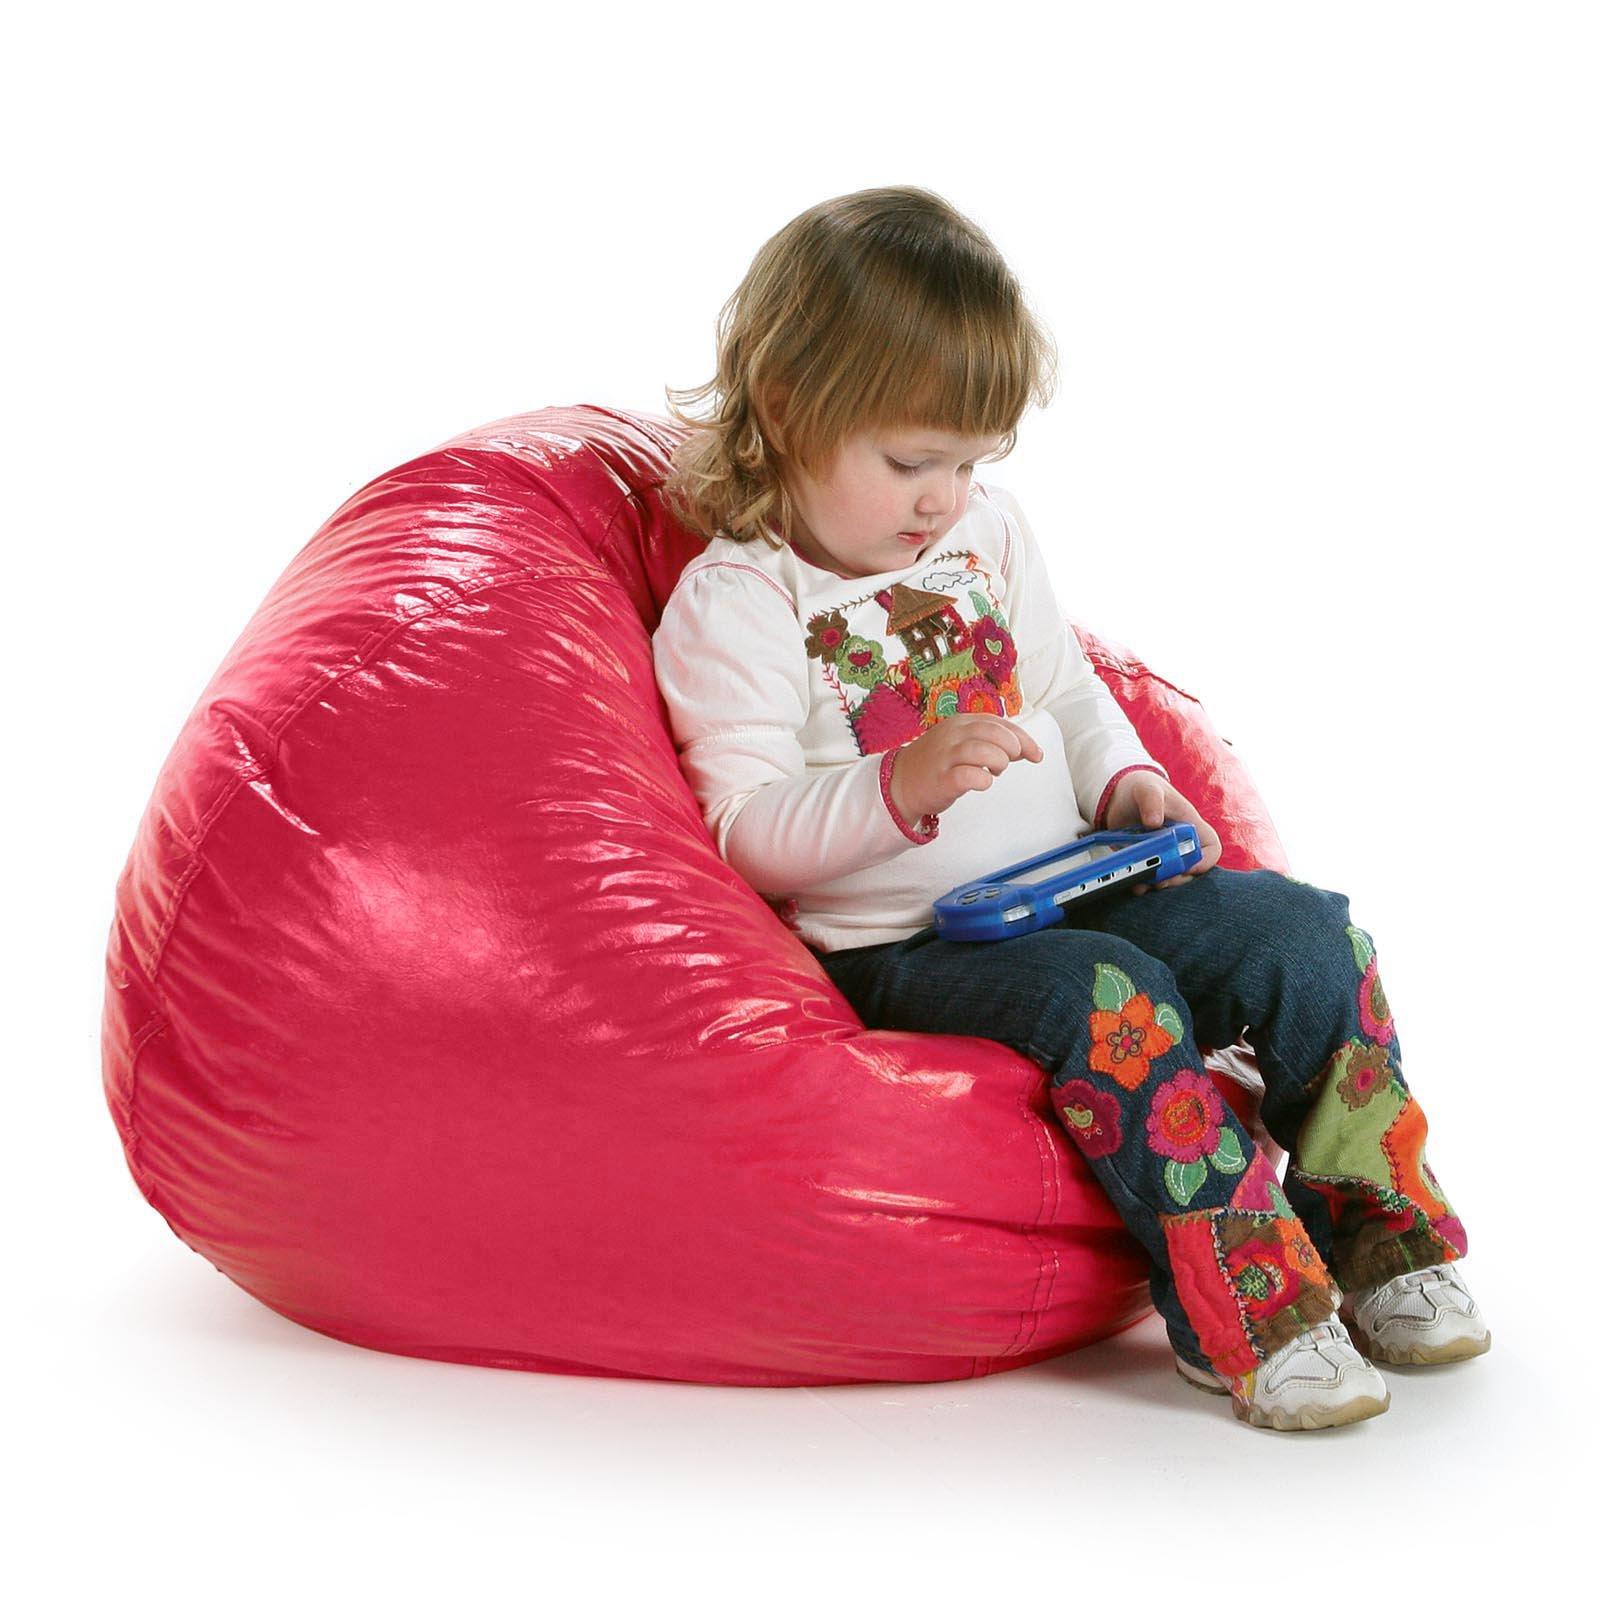 Astonishing Small Standard Vinyl Bean Bag Chair In 2019 Products Inzonedesignstudio Interior Chair Design Inzonedesignstudiocom